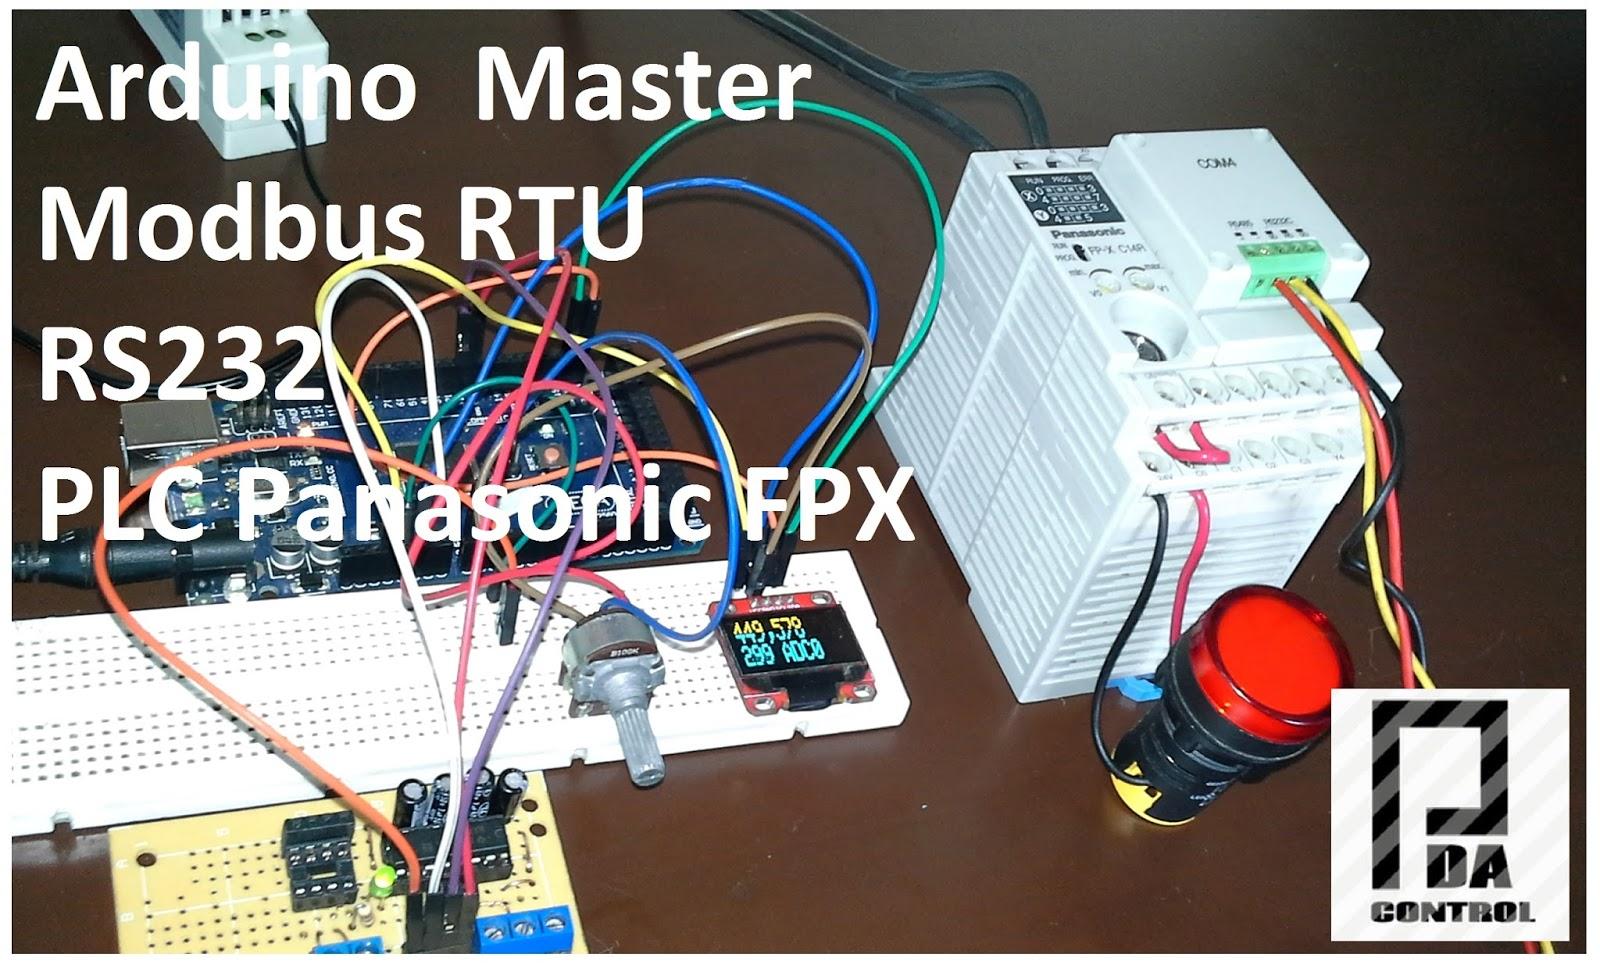 Pruebas Modbus RTU Maestro con Arduino via RS232 y PLC Panasonic FPX C14R